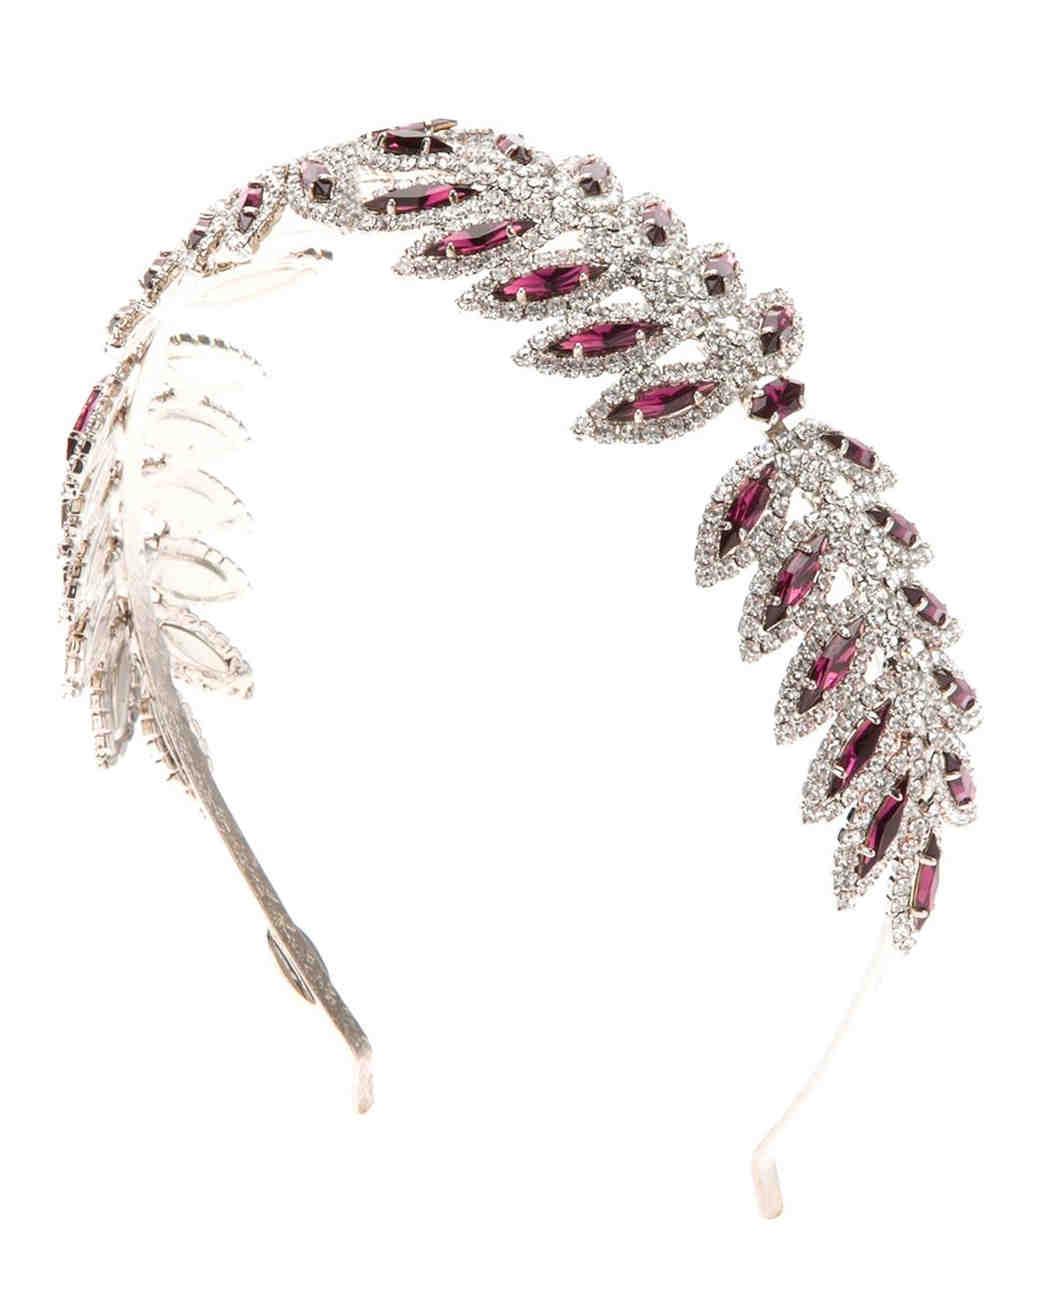 hair-accessories-louis-mariette-amour-headband-1014.jpg